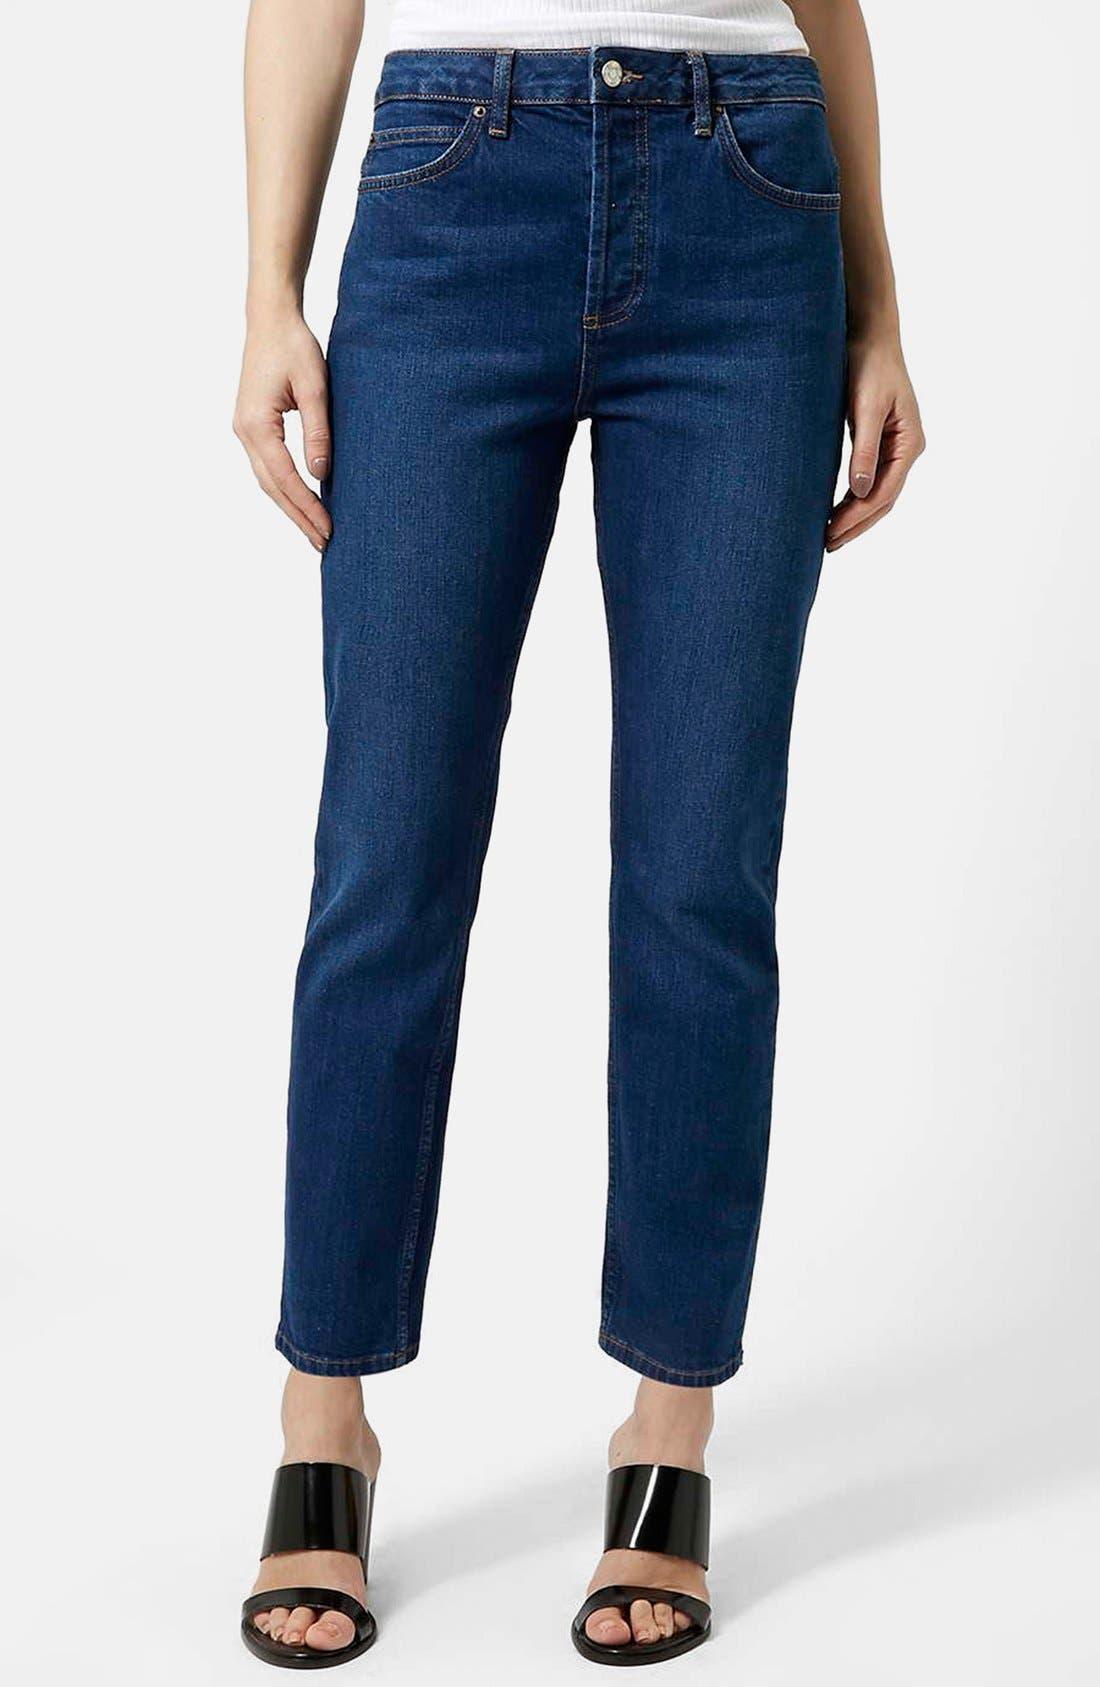 Alternate Image 1 Selected - Topshop Moto Indigo Girlfriend Jeans (Navy Blue)